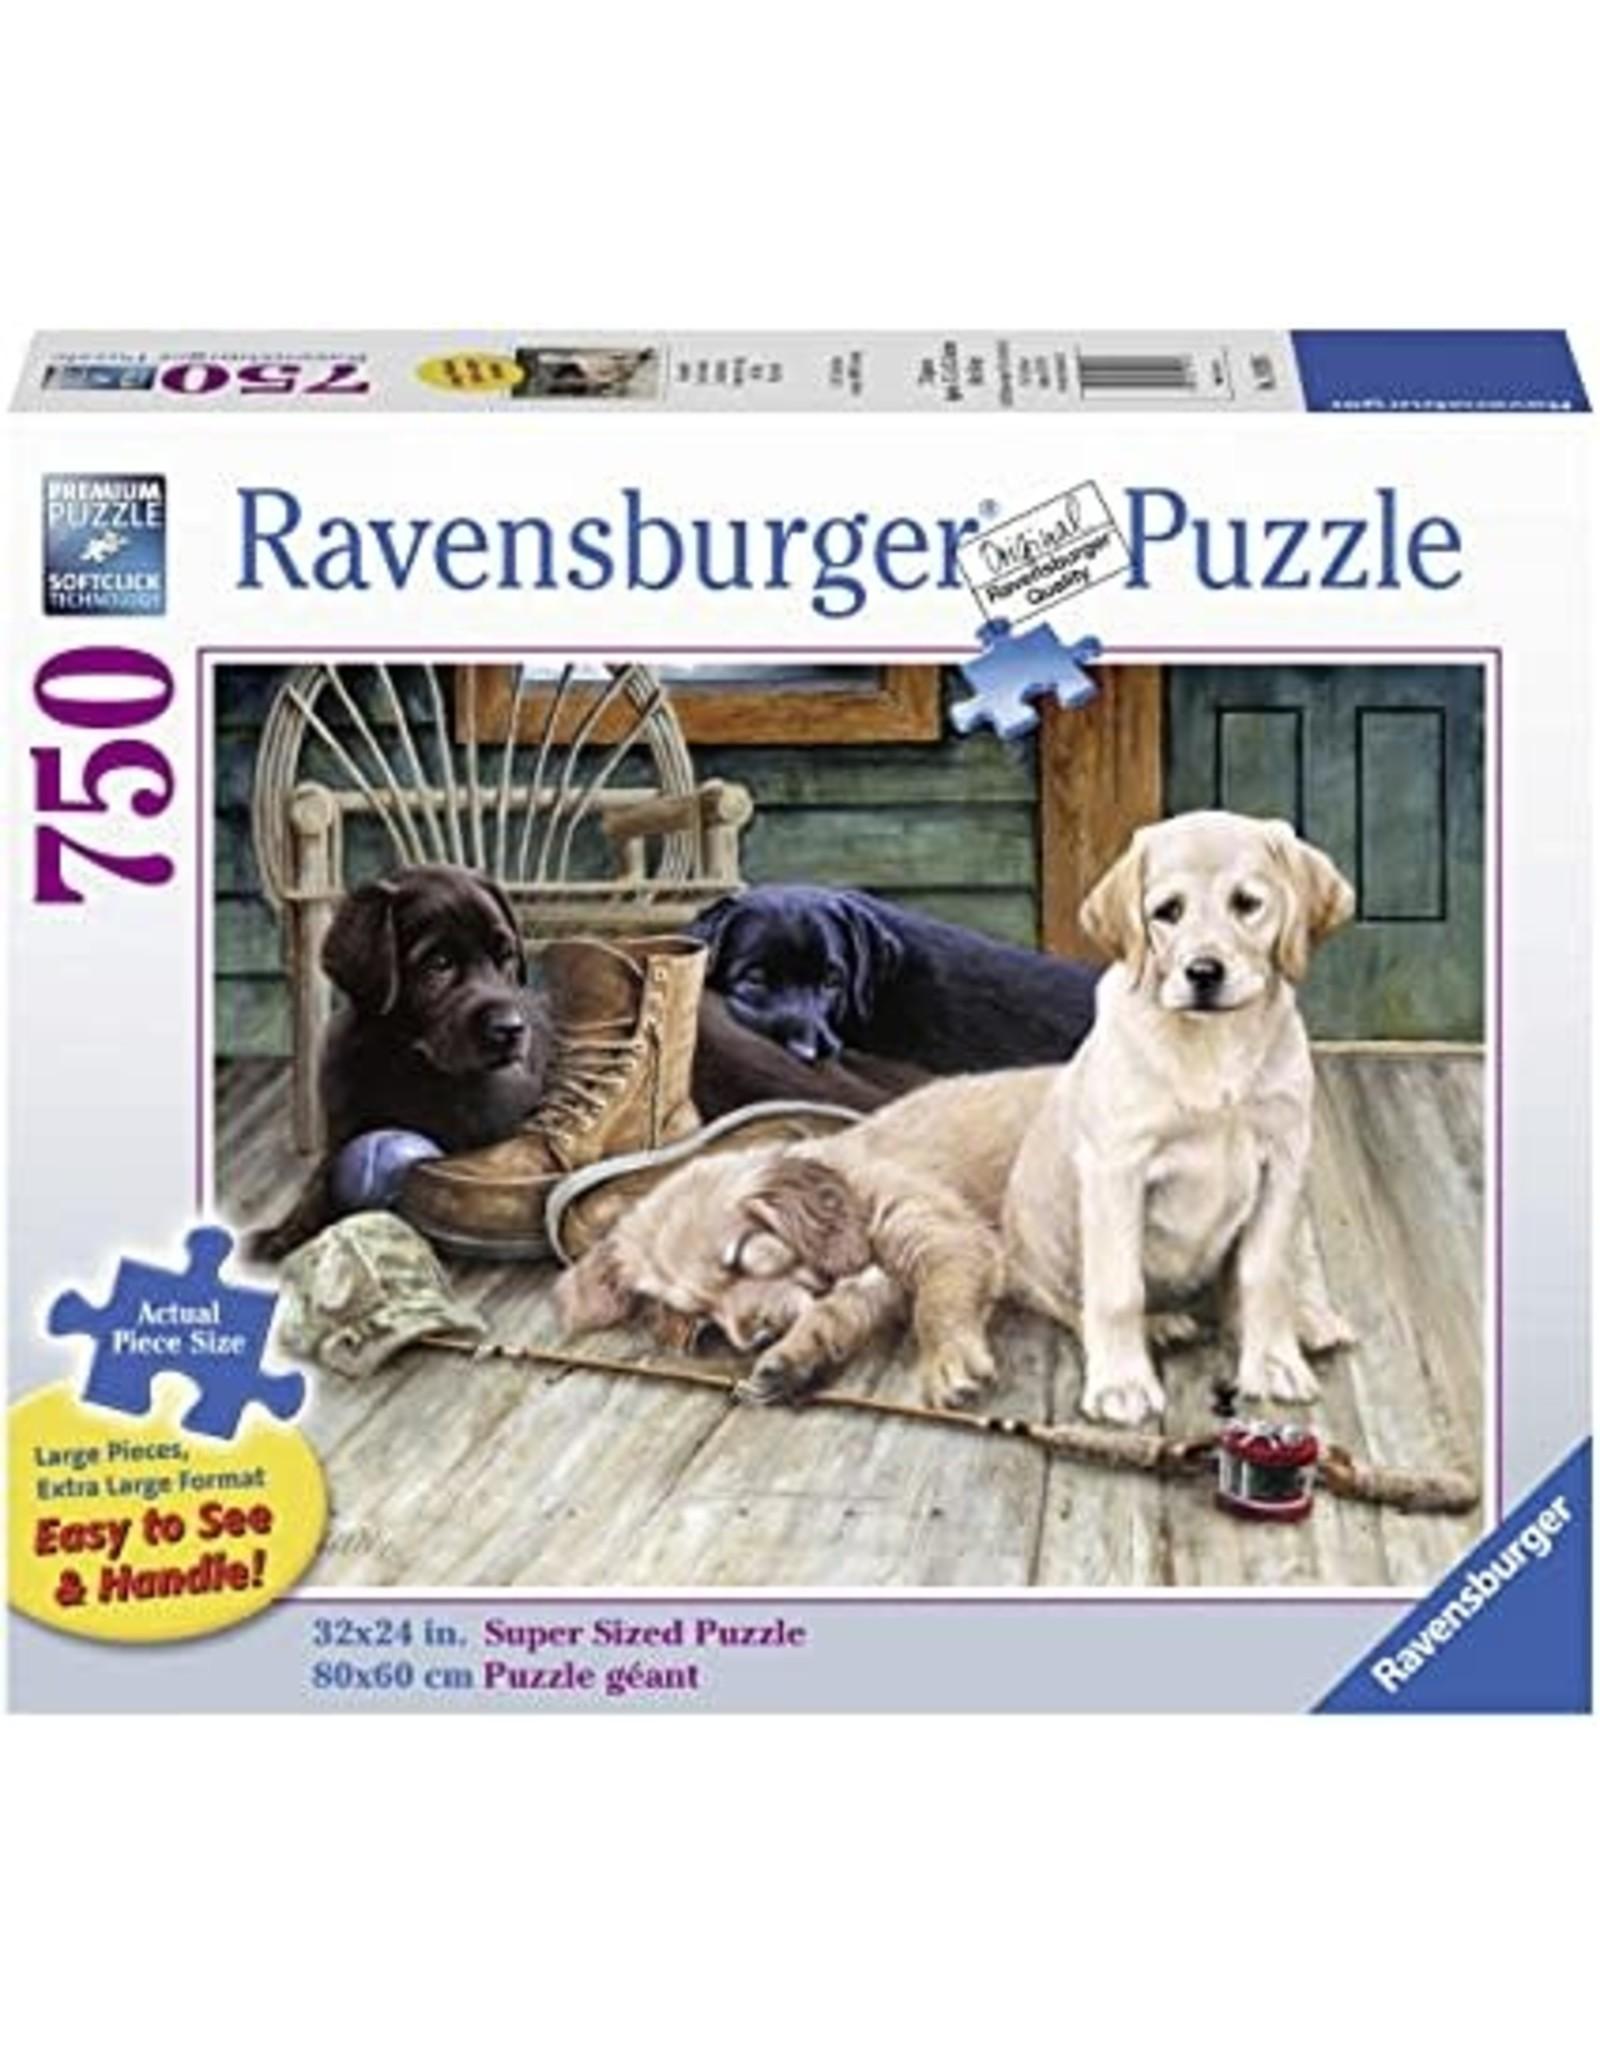 Ravensburger Ruff Day 750 pc